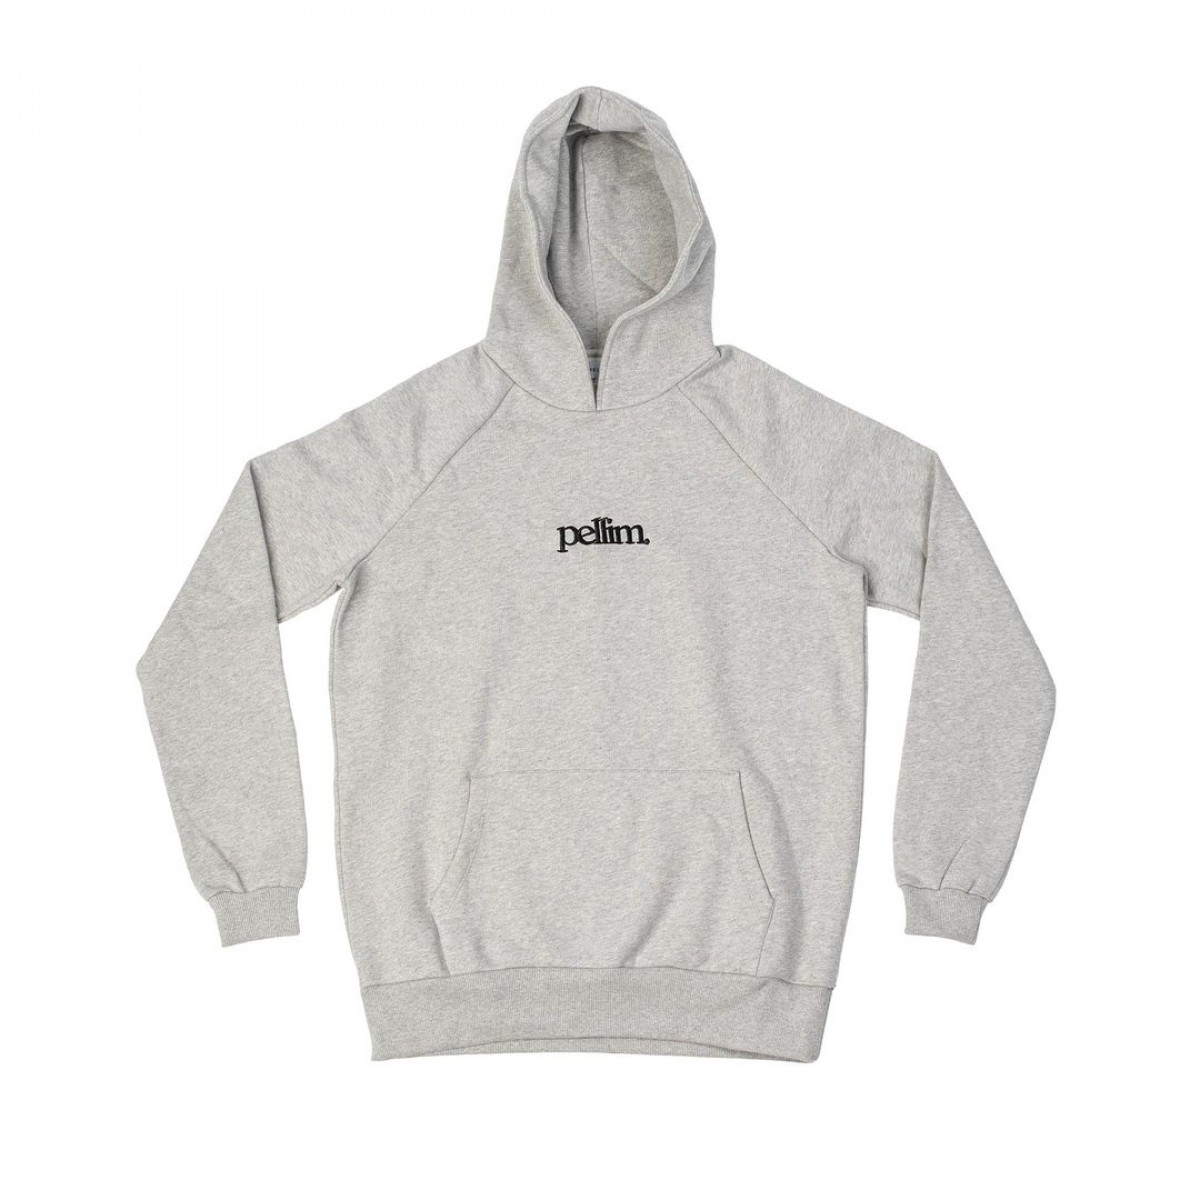 pellim. hoodie basic grau